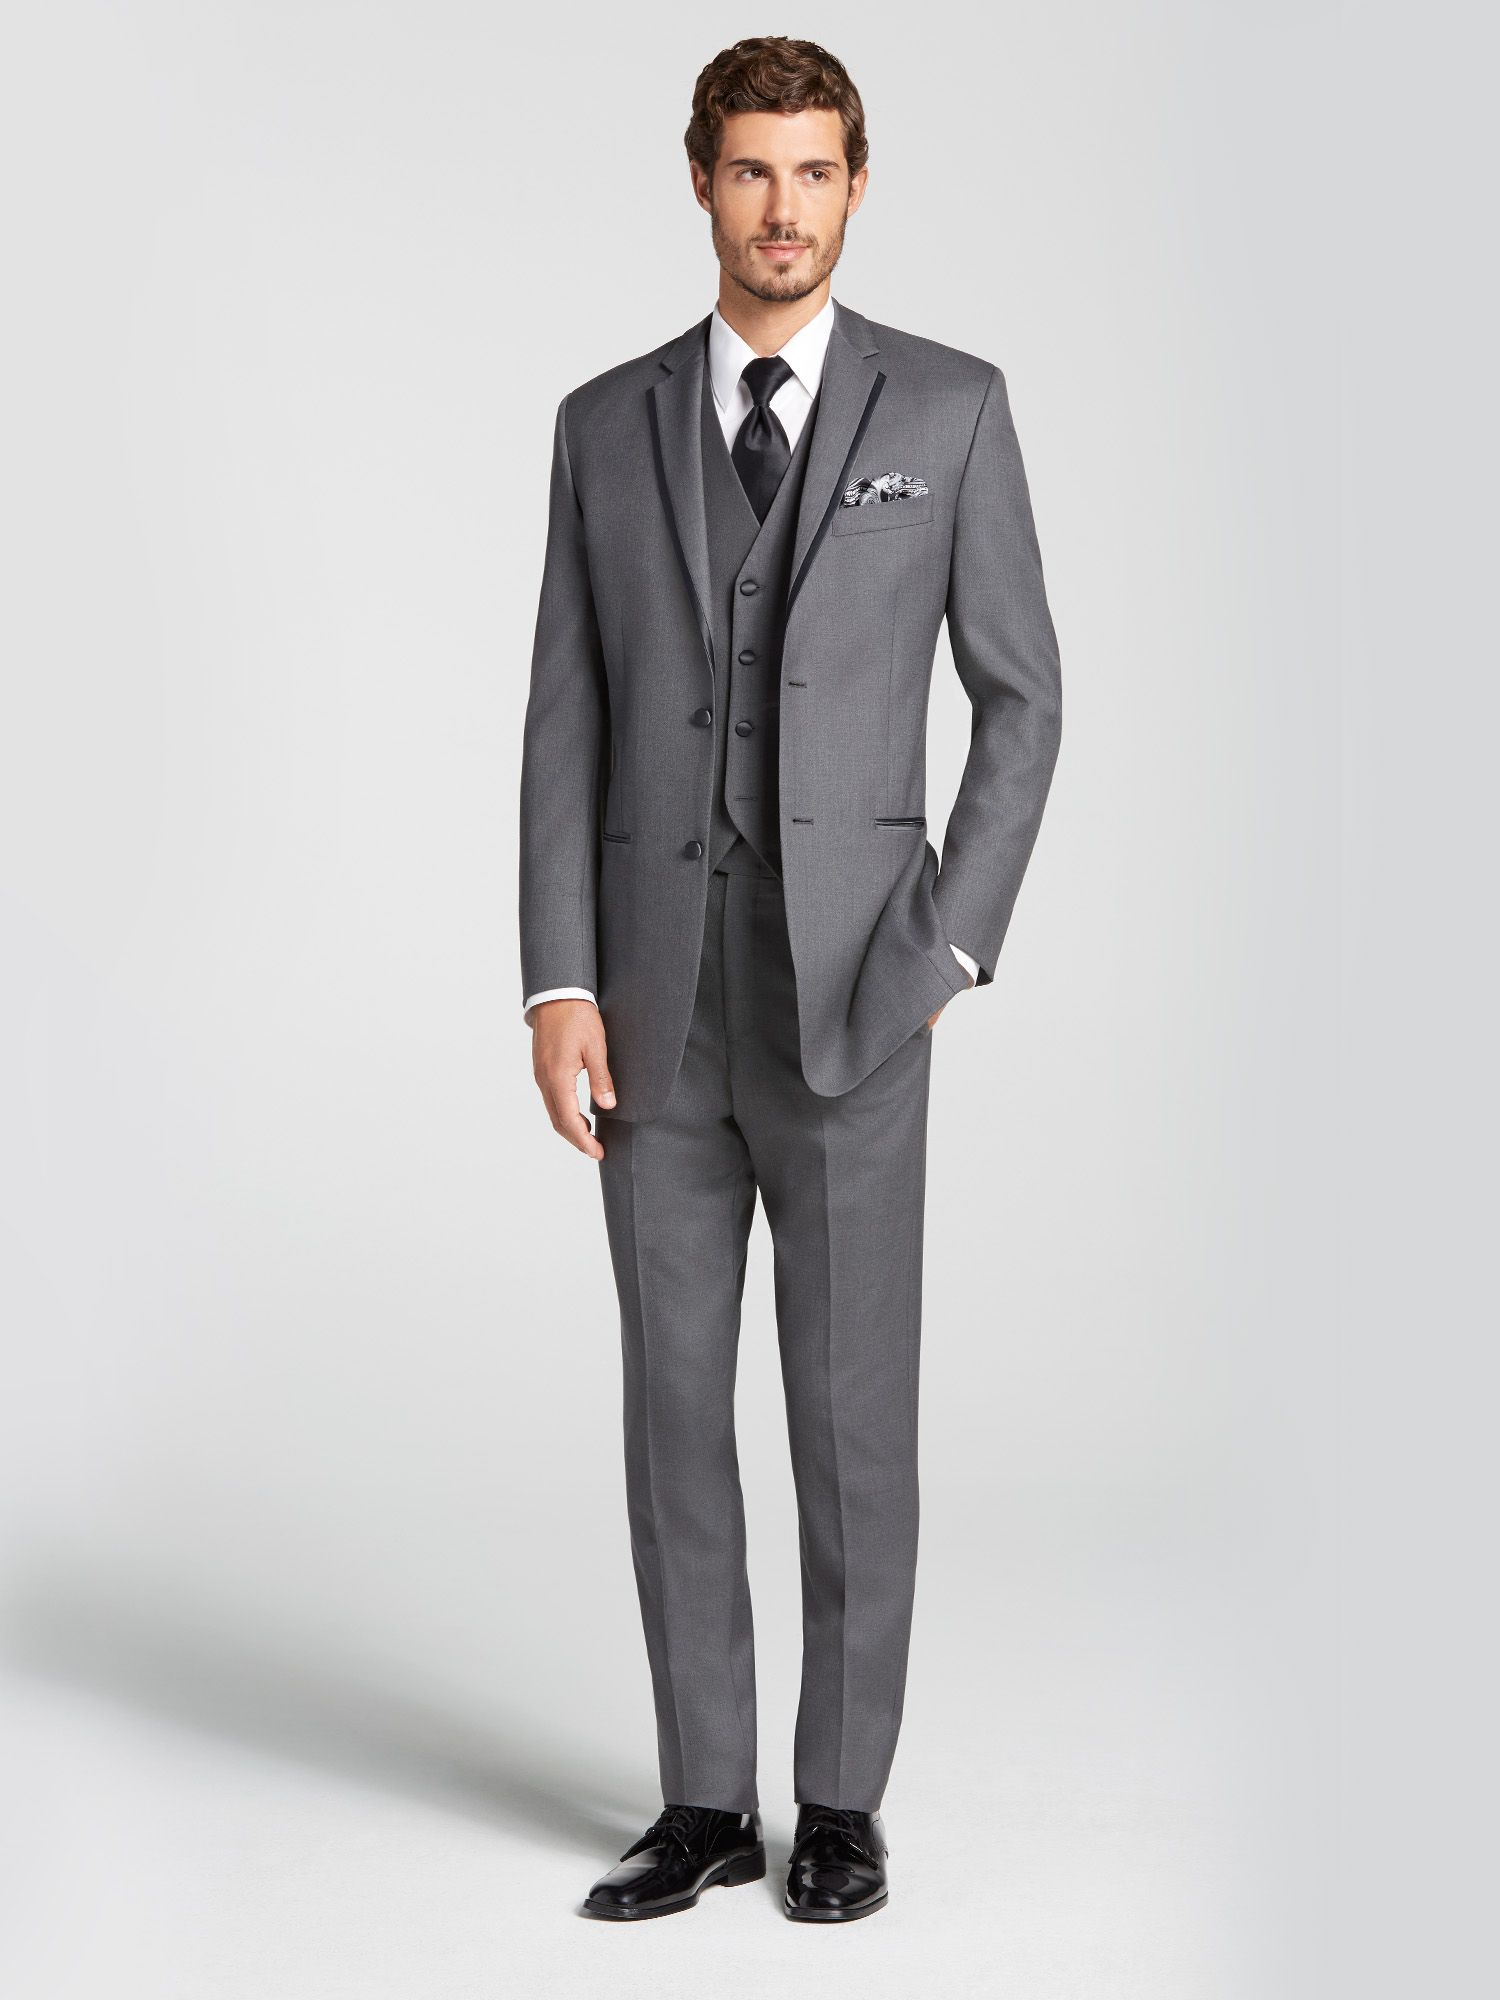 Gray Notch Lapel Tuxedo by Vera Wang  Tuxedo Rental  Mens Wearhouse